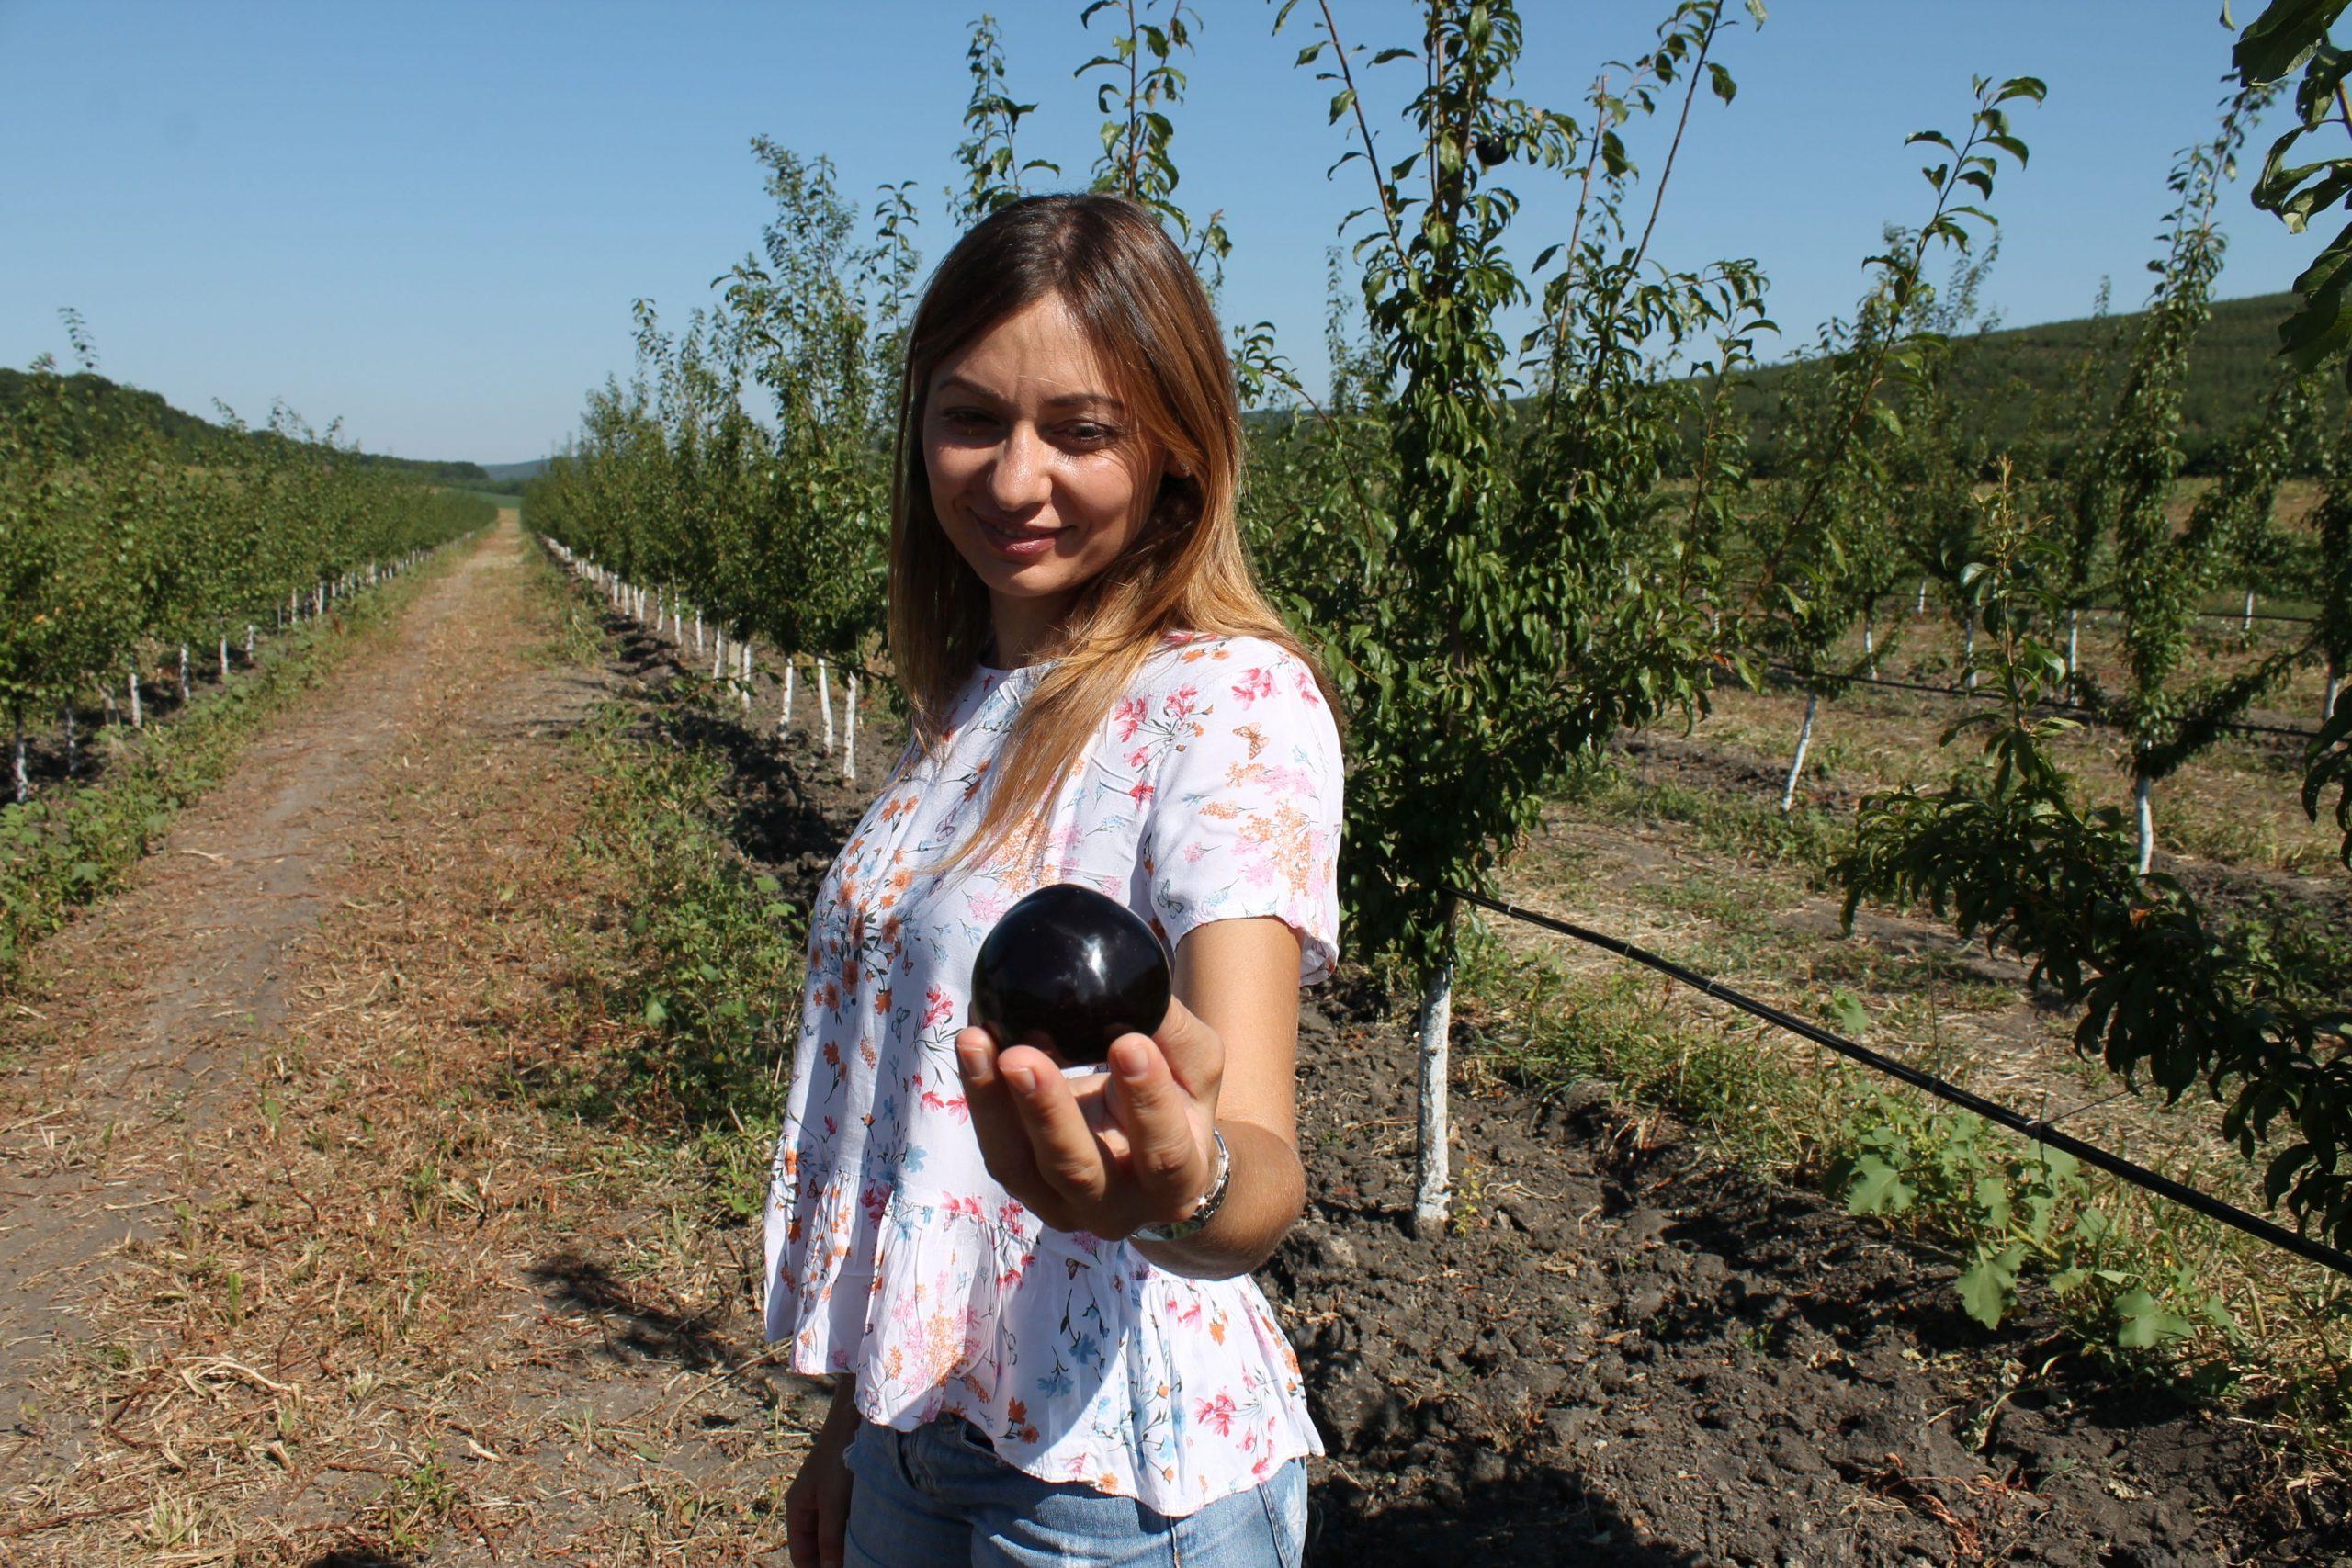 Primele prune culese de familia Chișcă. Fotografii de Lilia Zaharia